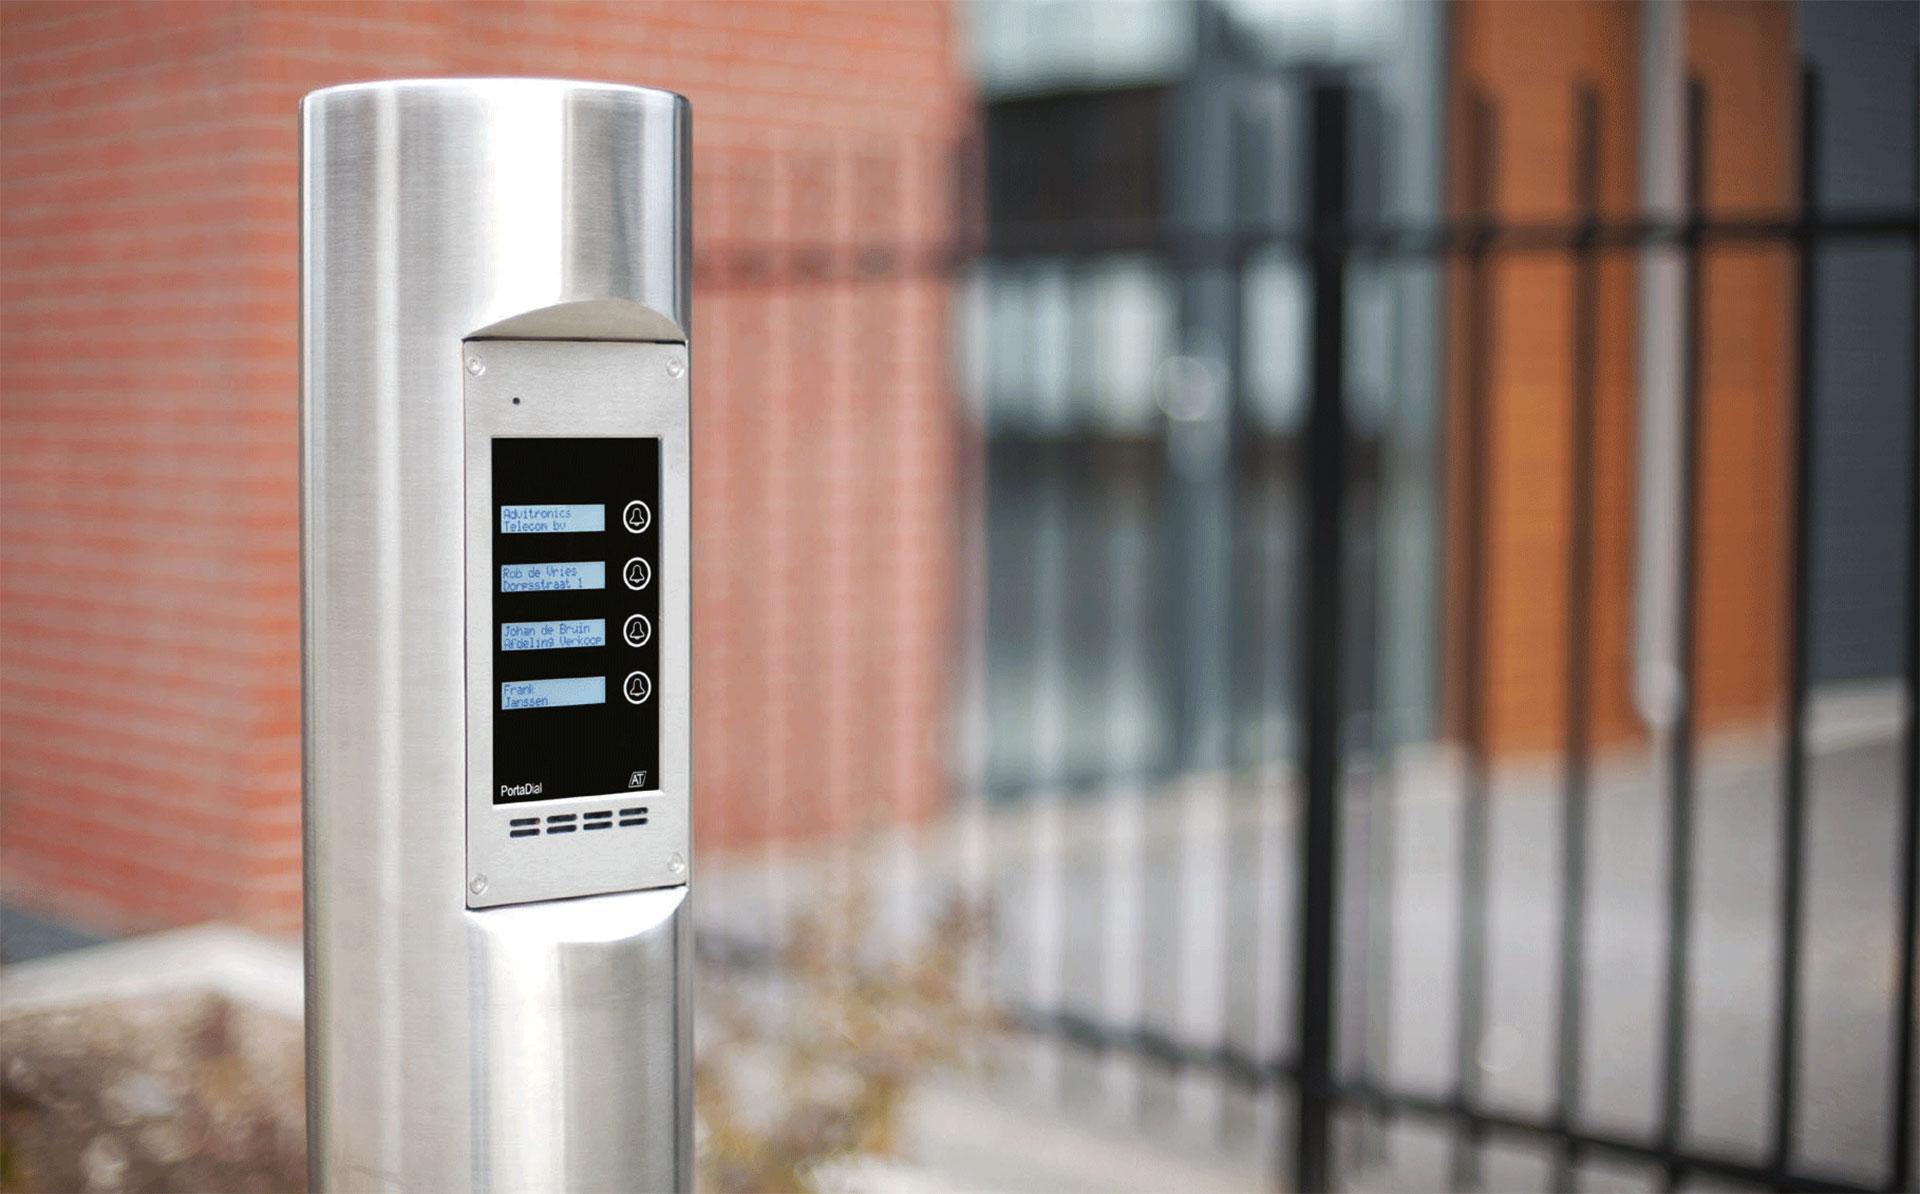 deurintercom series - Zuilintercom - PortaDial